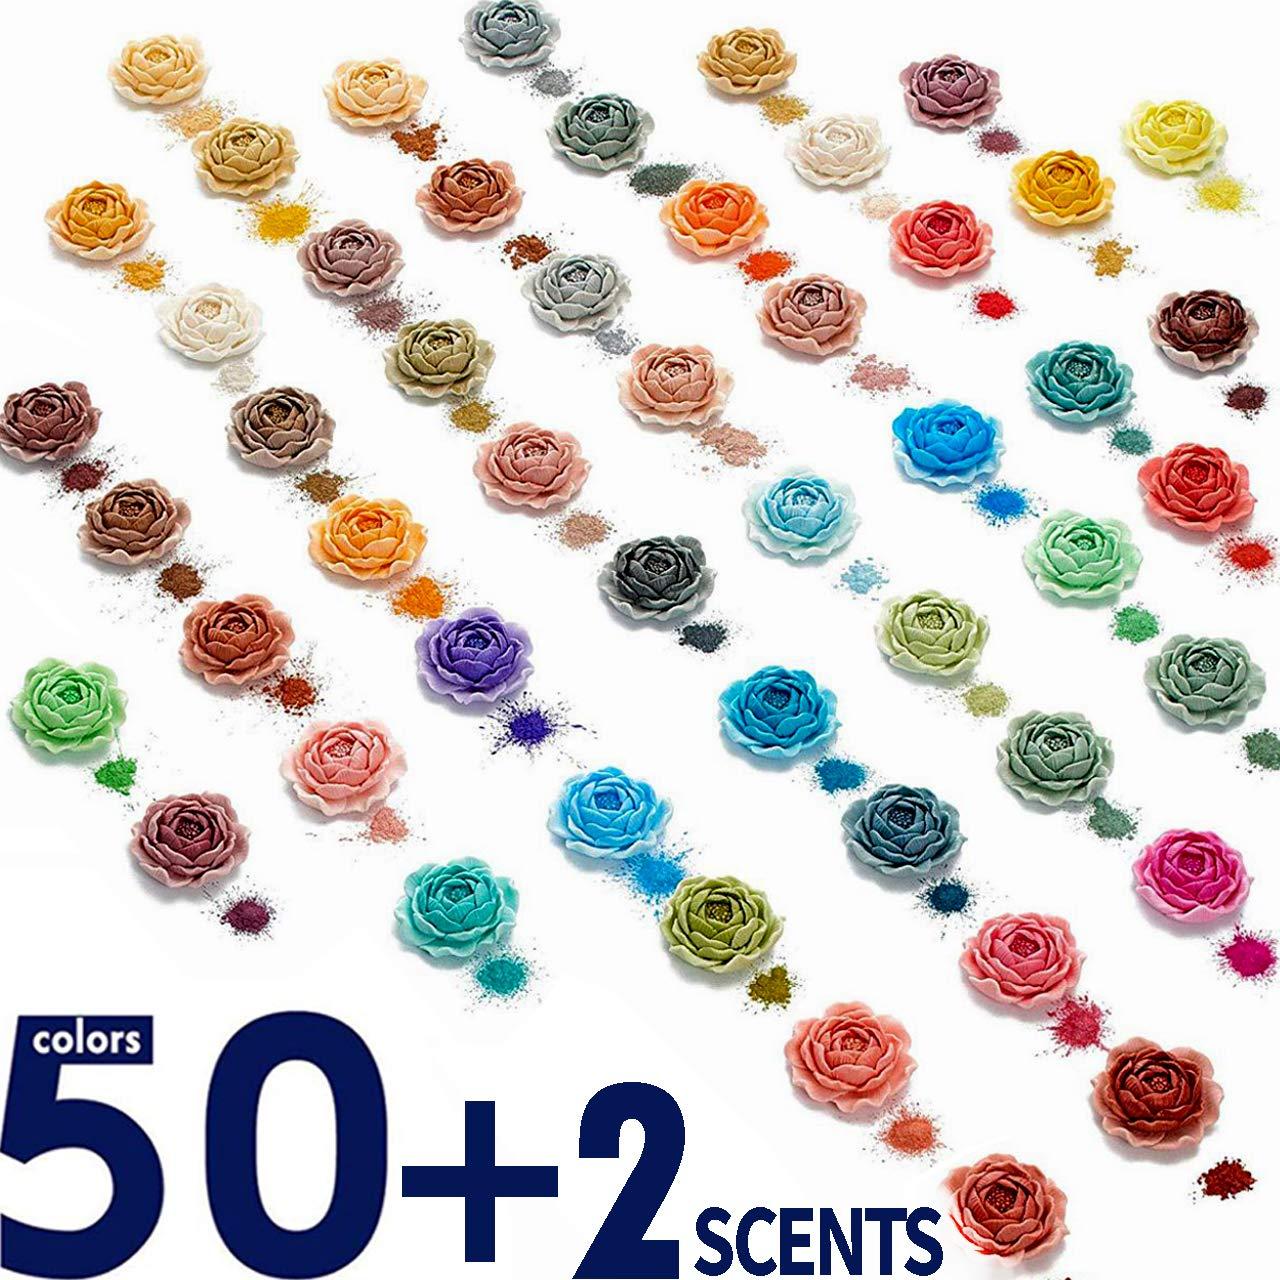 Mica Powder - Soap Making Kit - Powdered Pigments Set - Soap Making dye - 50 Coloring - Hand Soap Making Supplies - Resin Dye - Mica Powder Organic for Soap Molds